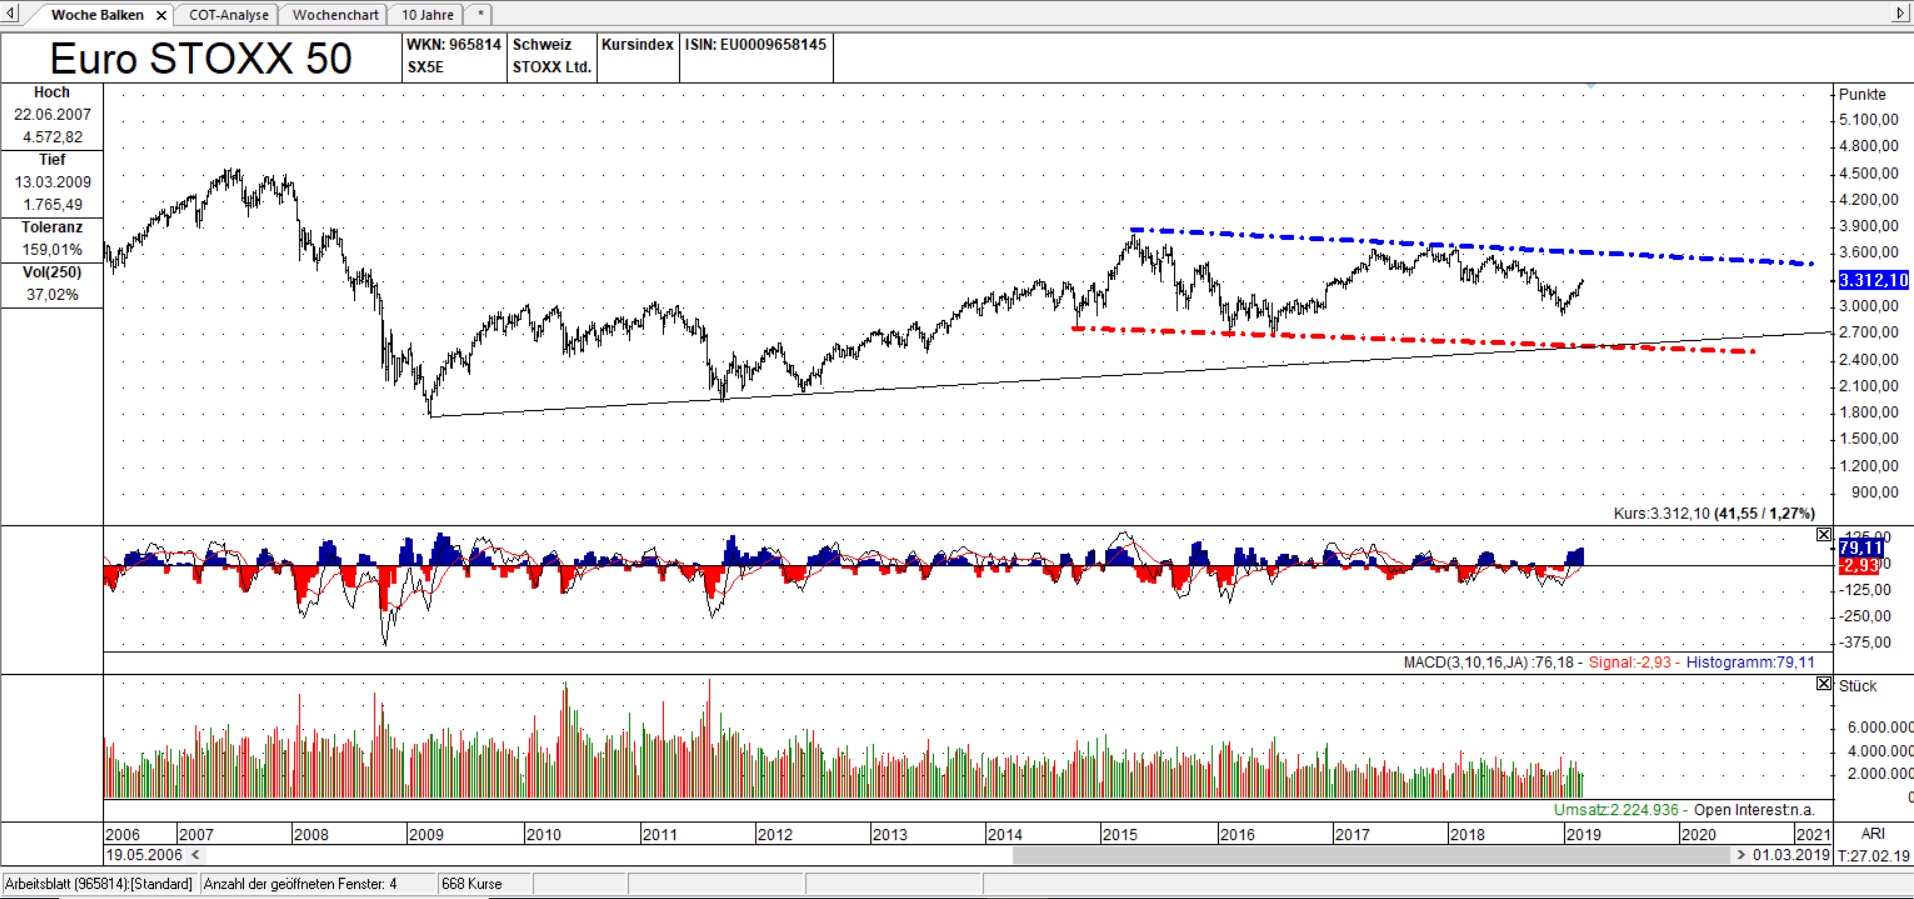 SX5E Bar Wochen Chart